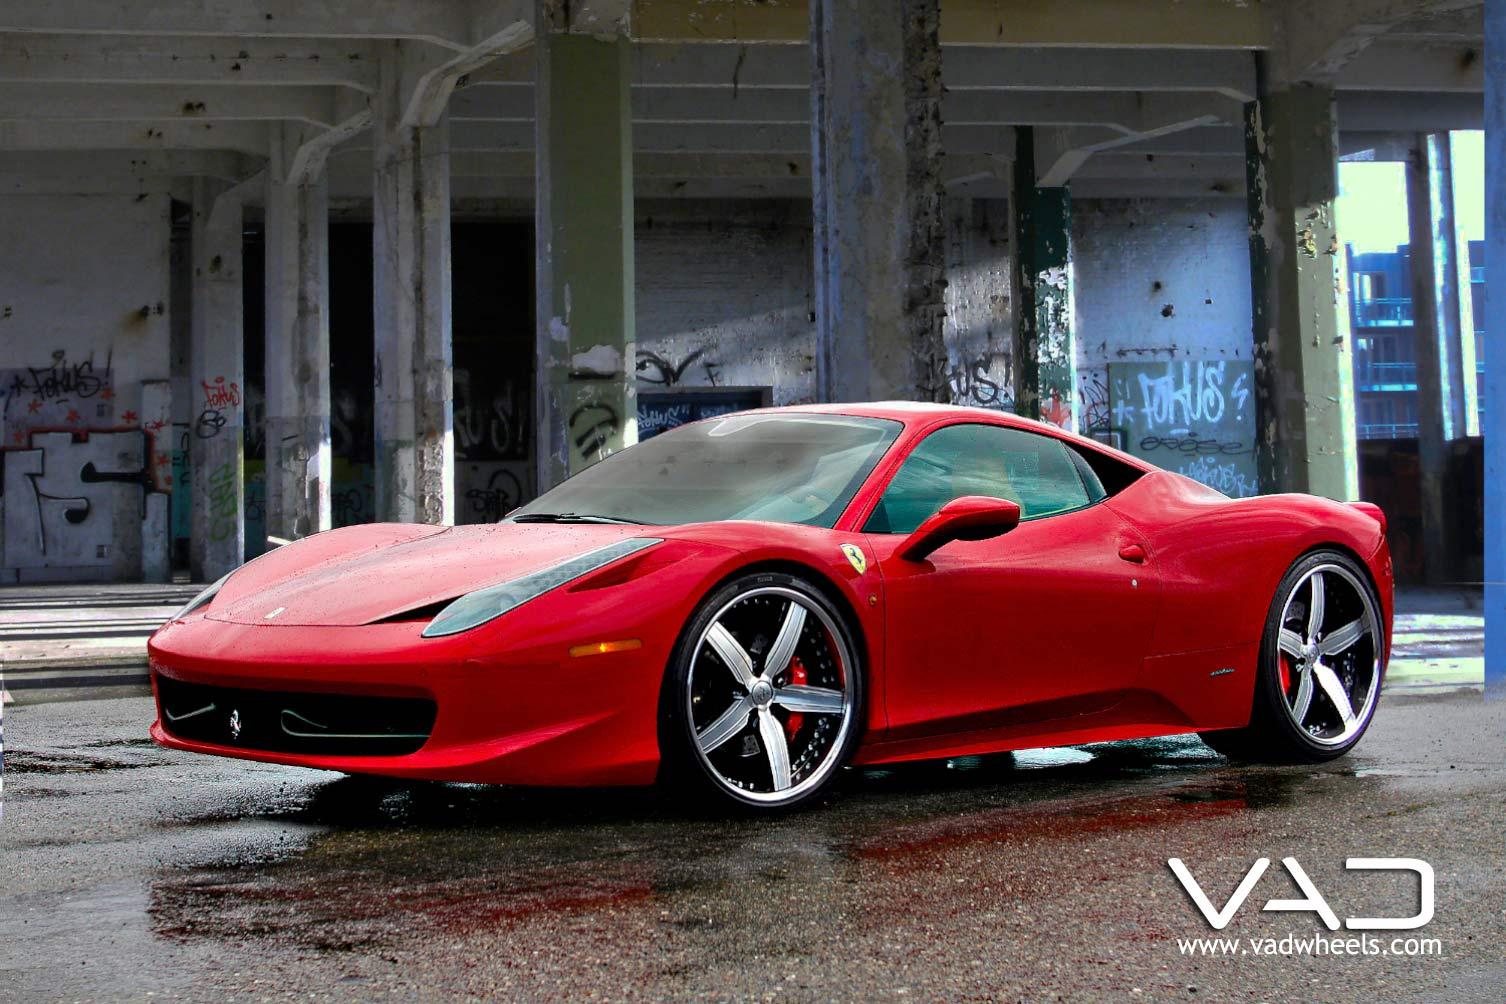 Ferrari-458-Italia-Fitted-With-20-In-Trafficstar-STR